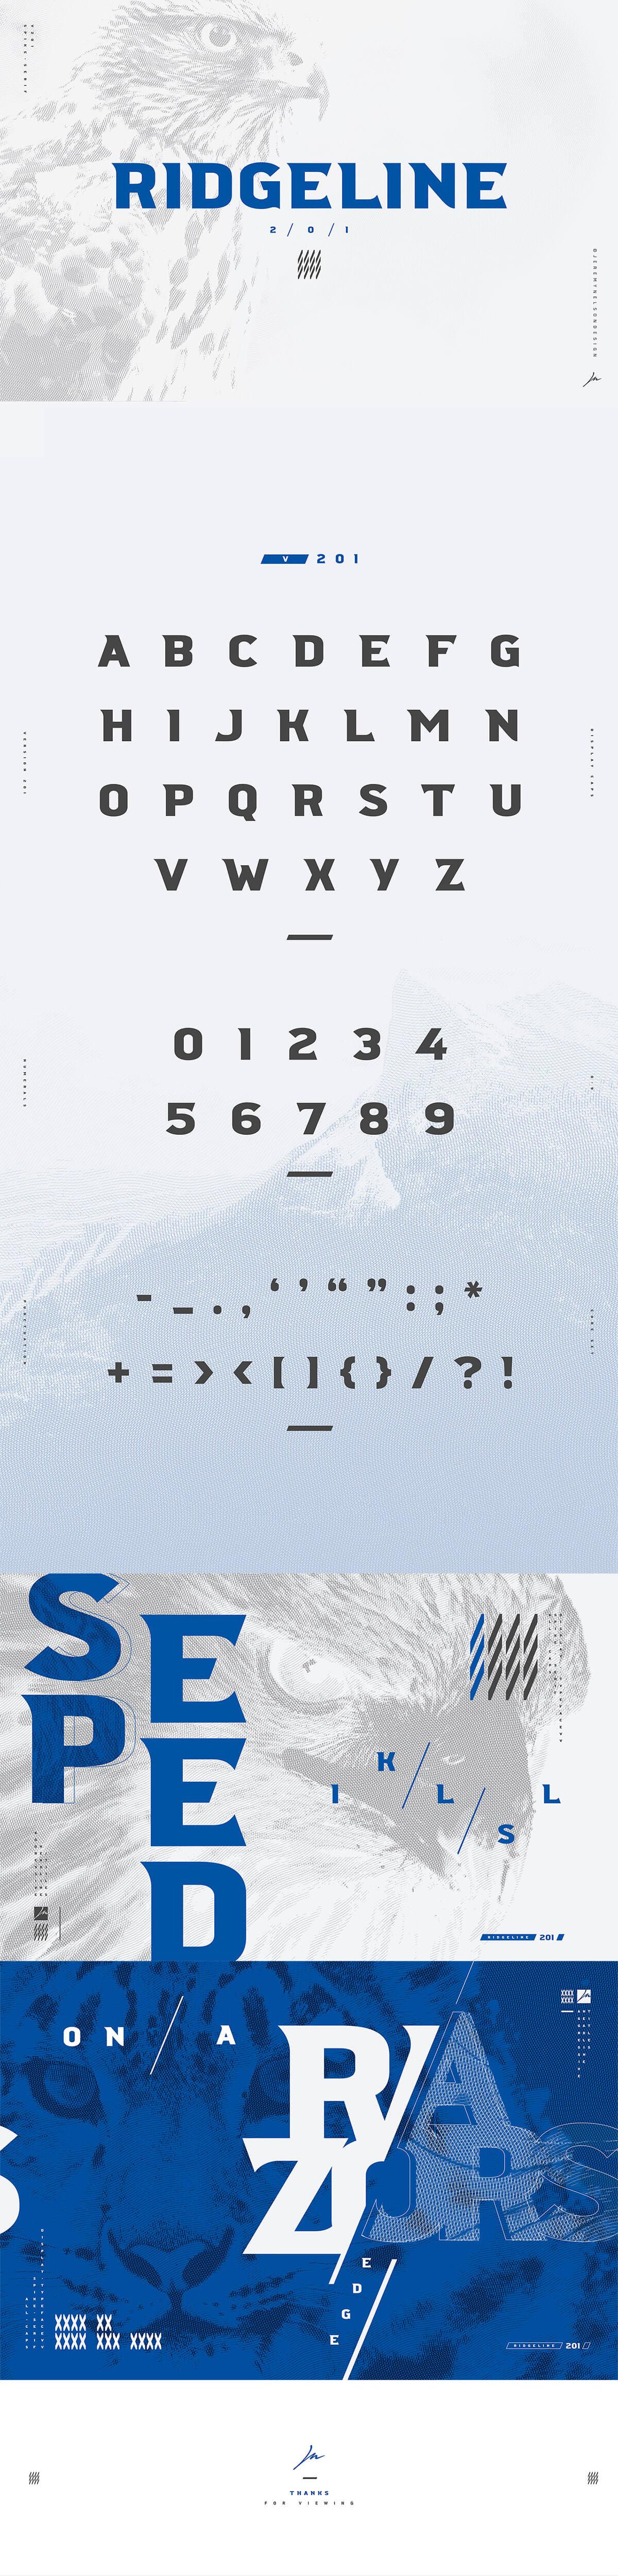 Free Ridgeline 201 Display Font